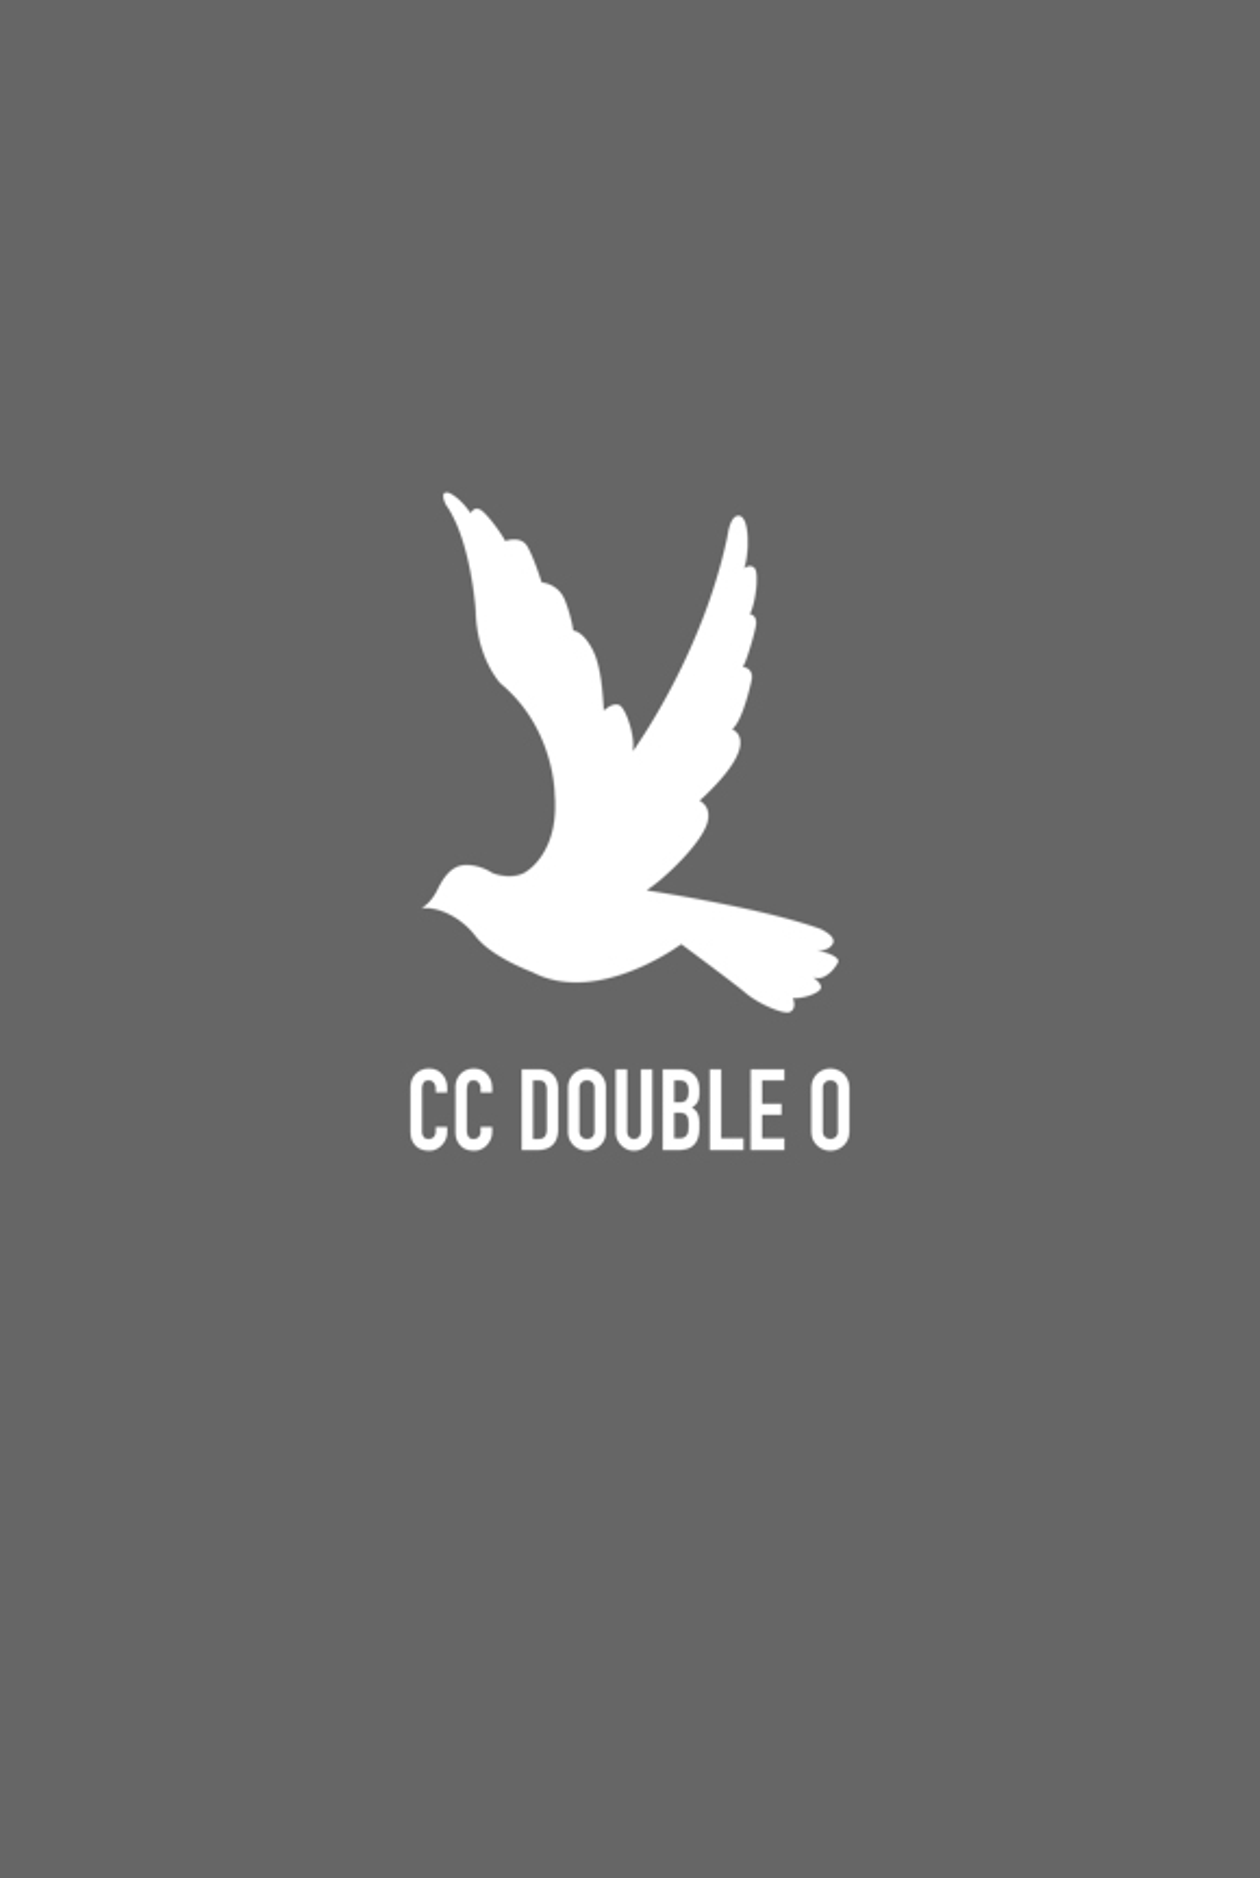 All-Over Printed CC DOUBLE O Polo